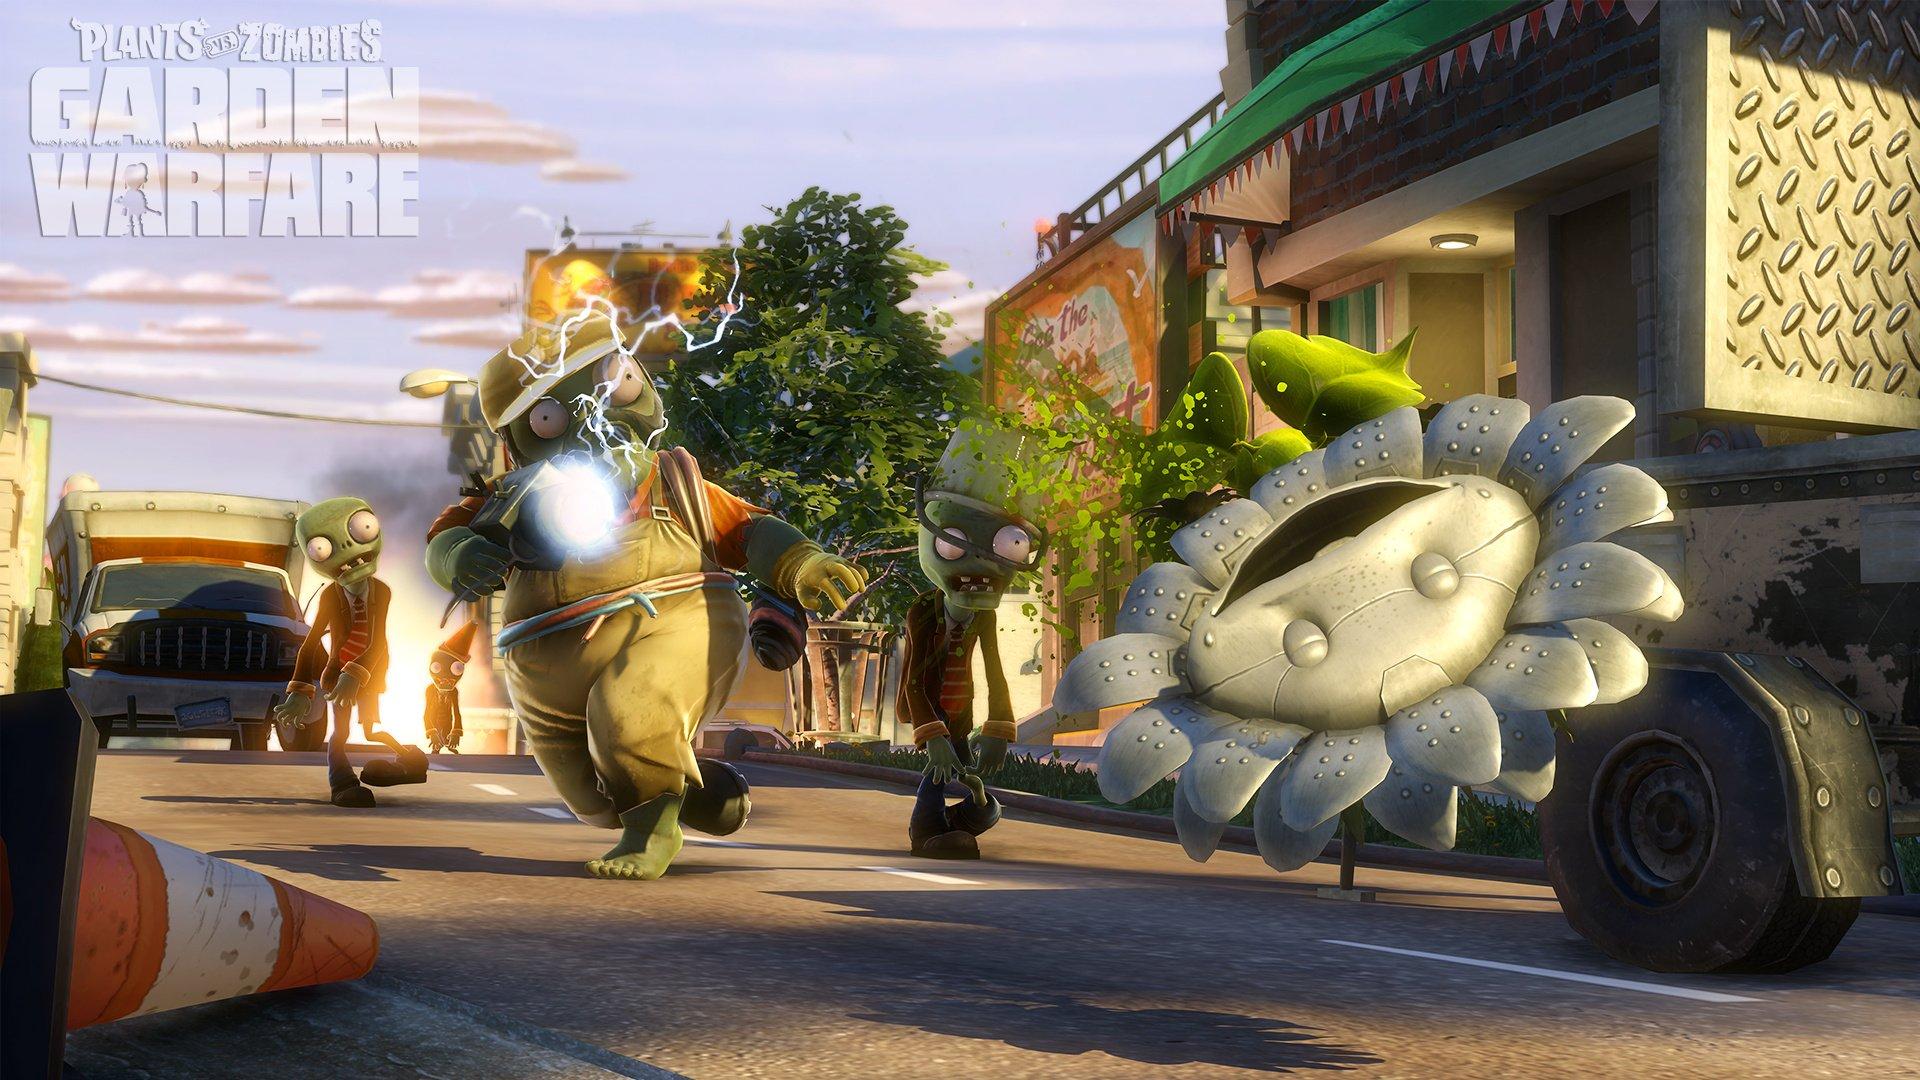 Plants vs. Zombies: Garden Warfare (PS4 / PlayStation 4